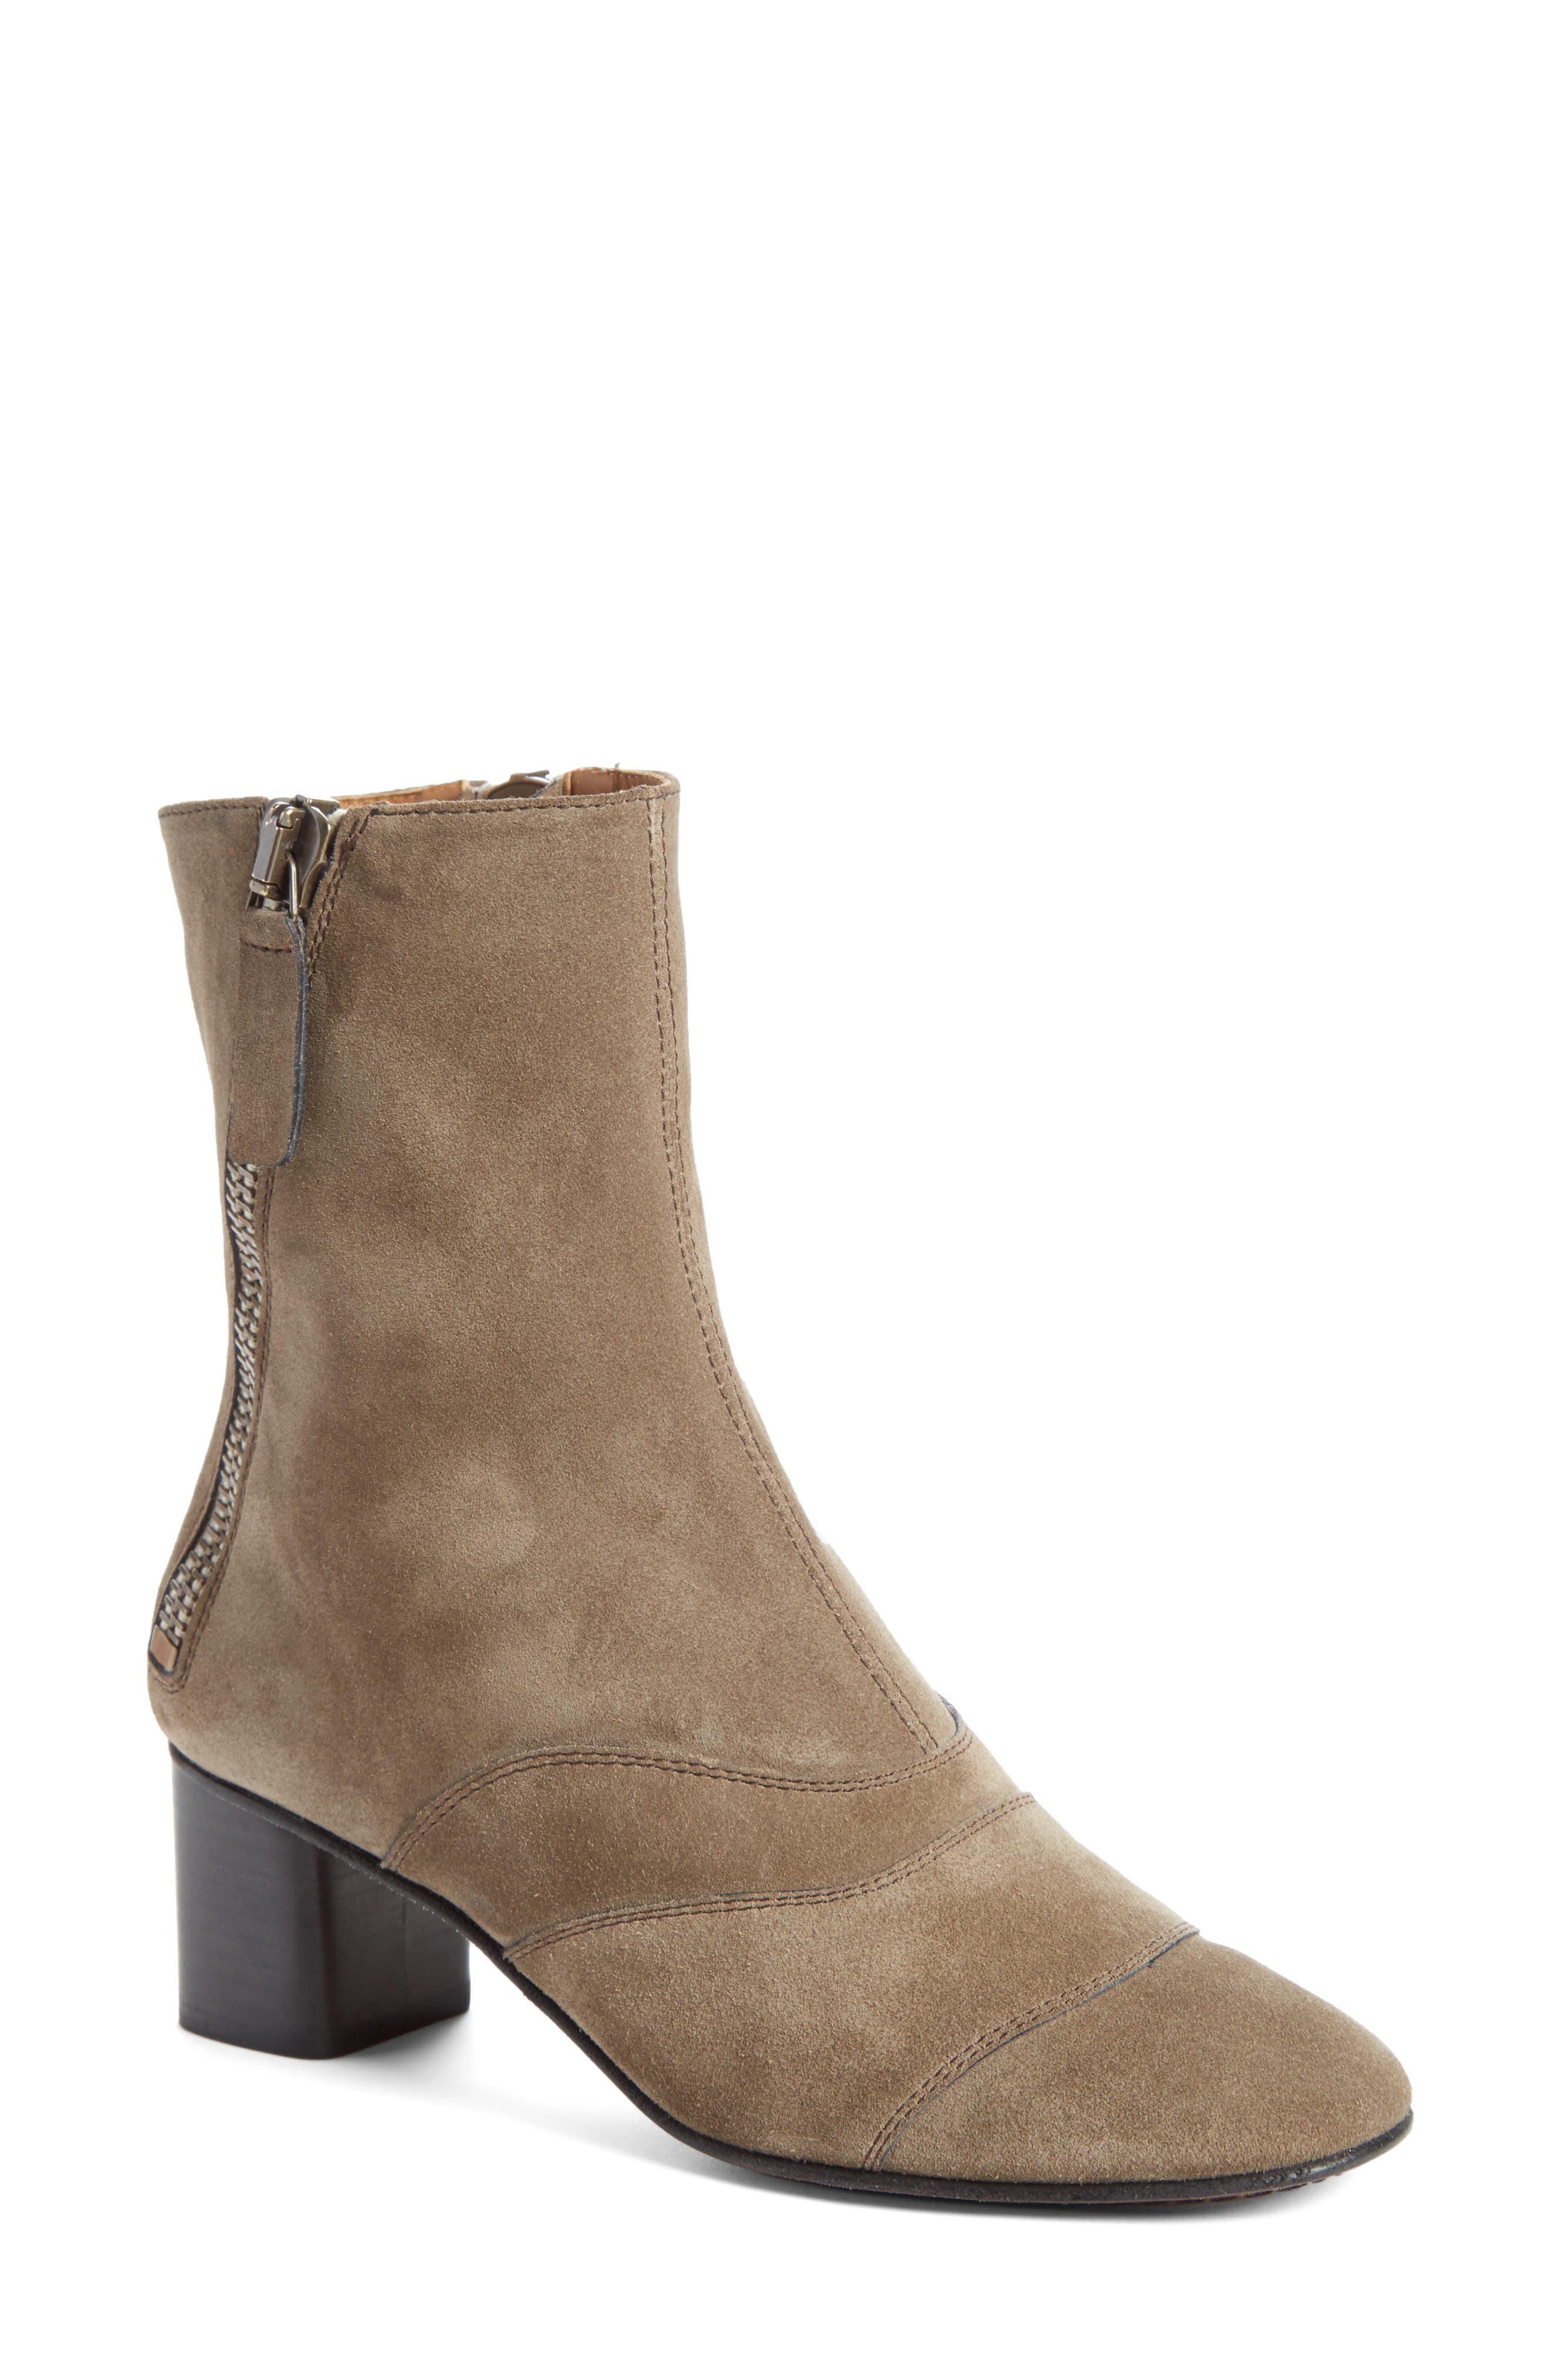 Alternate Image 1 Selected - Chloé Lexie Block Heel Boot (Women)